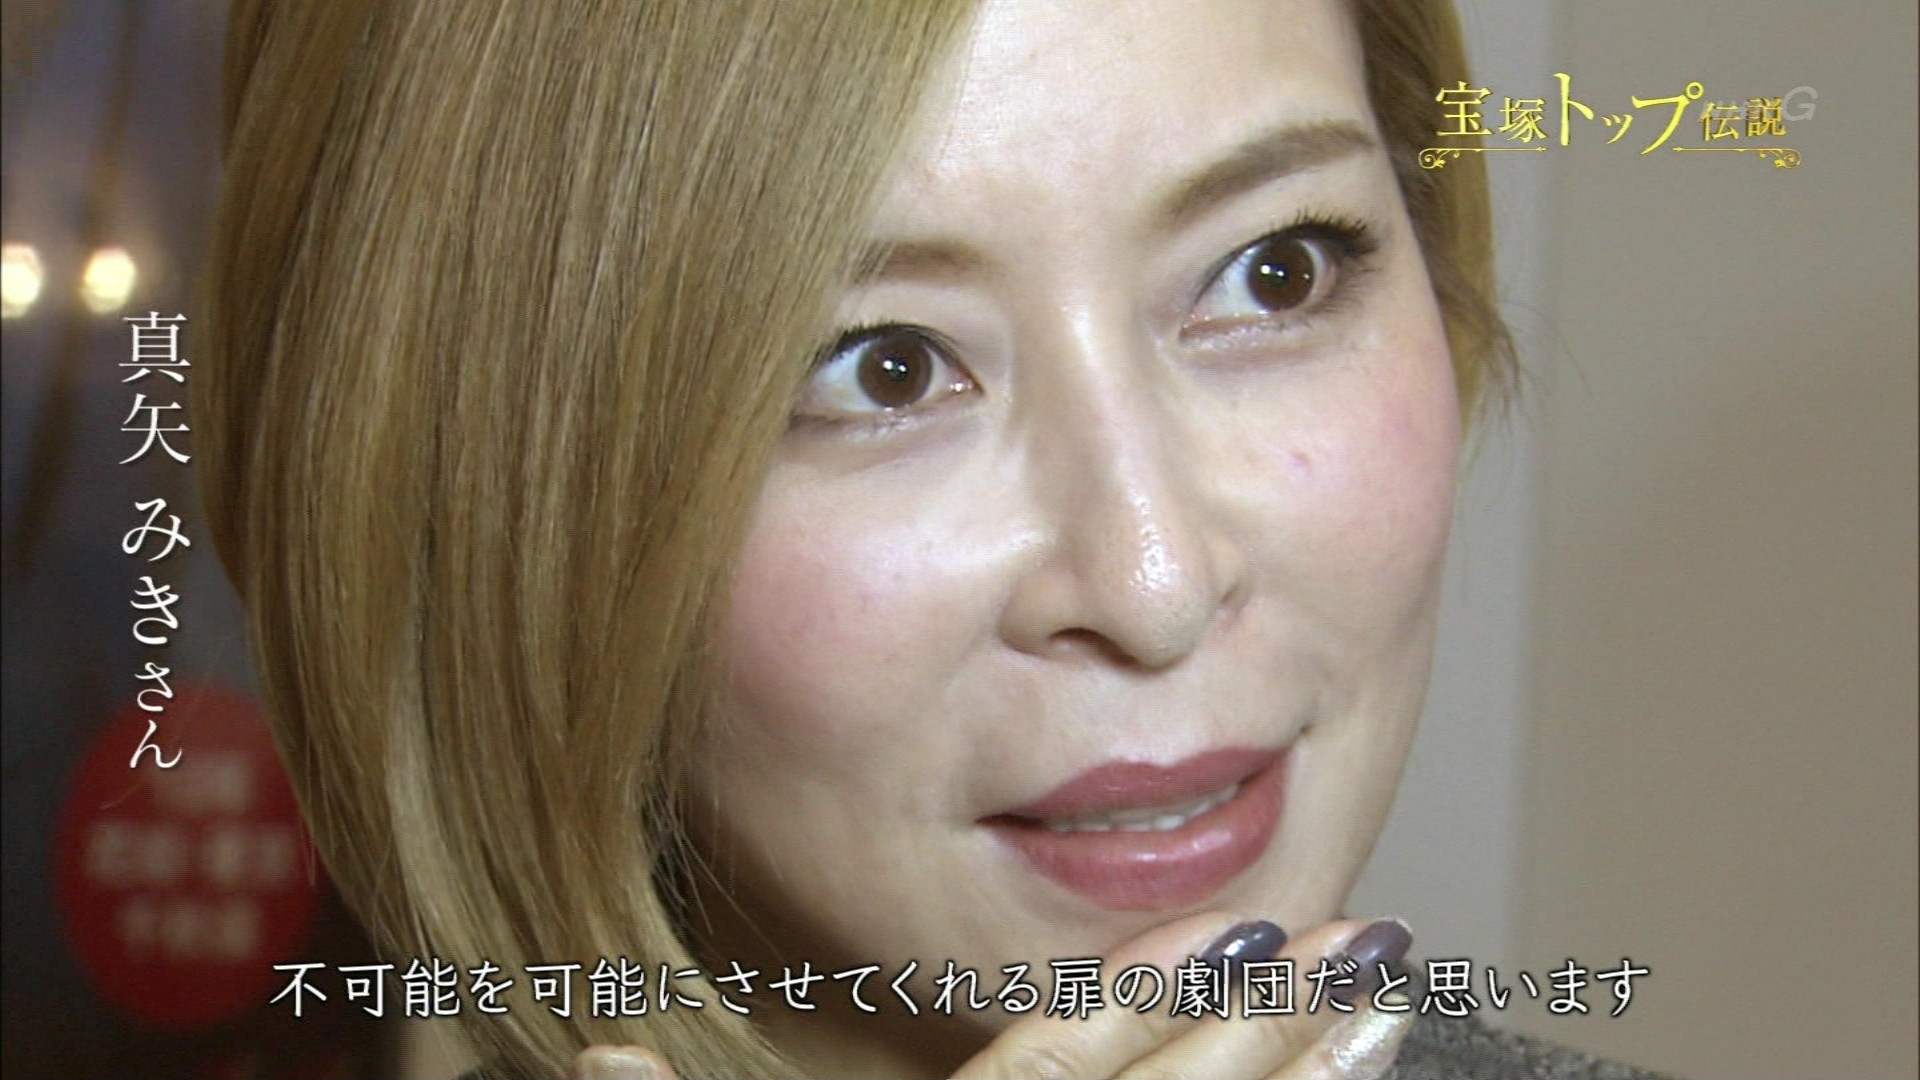 Nスペ「宝塚トップ伝説~熱狂の100年~」 : こんなテレビを見た。